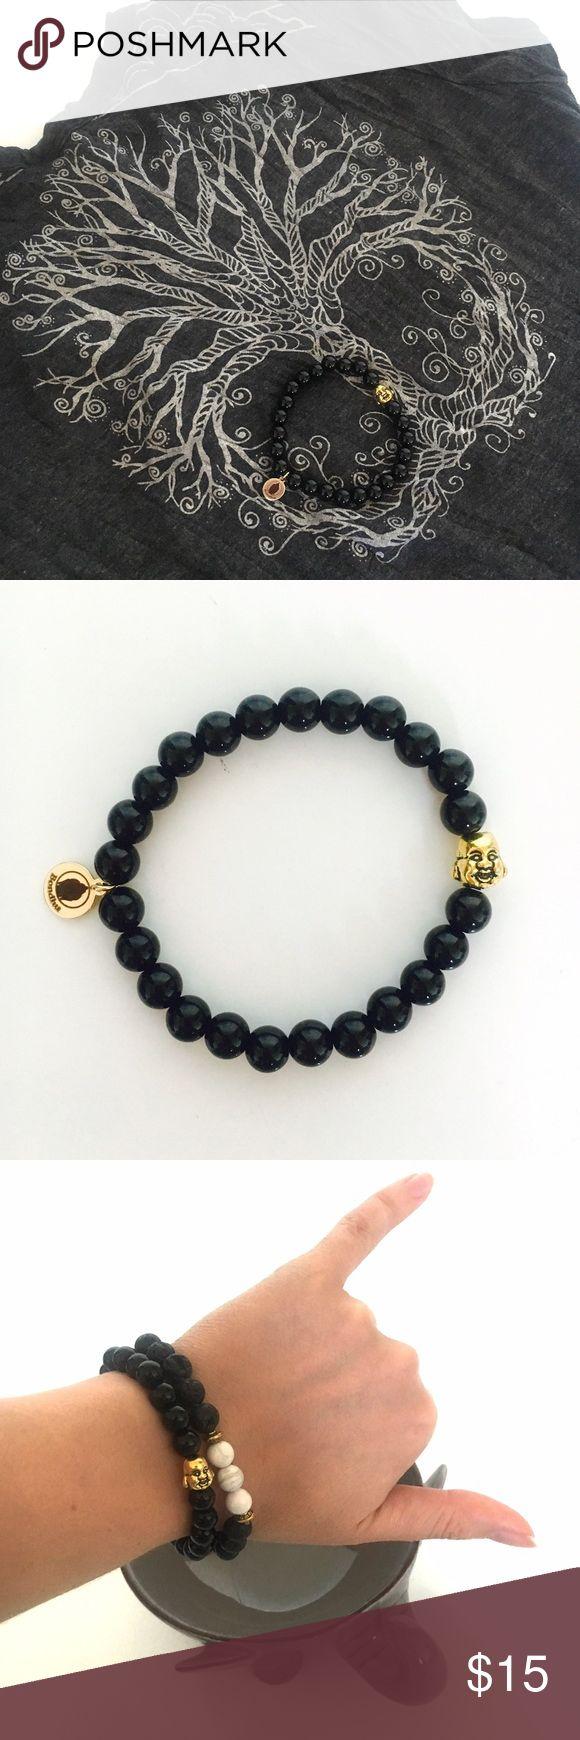 Buddha Black Tourmaline Mala Bracelet Black tourmaline mala bead bracelet with Buddha, gold plated tag, and stretchy band. Bondhu Jewelry Bracelets